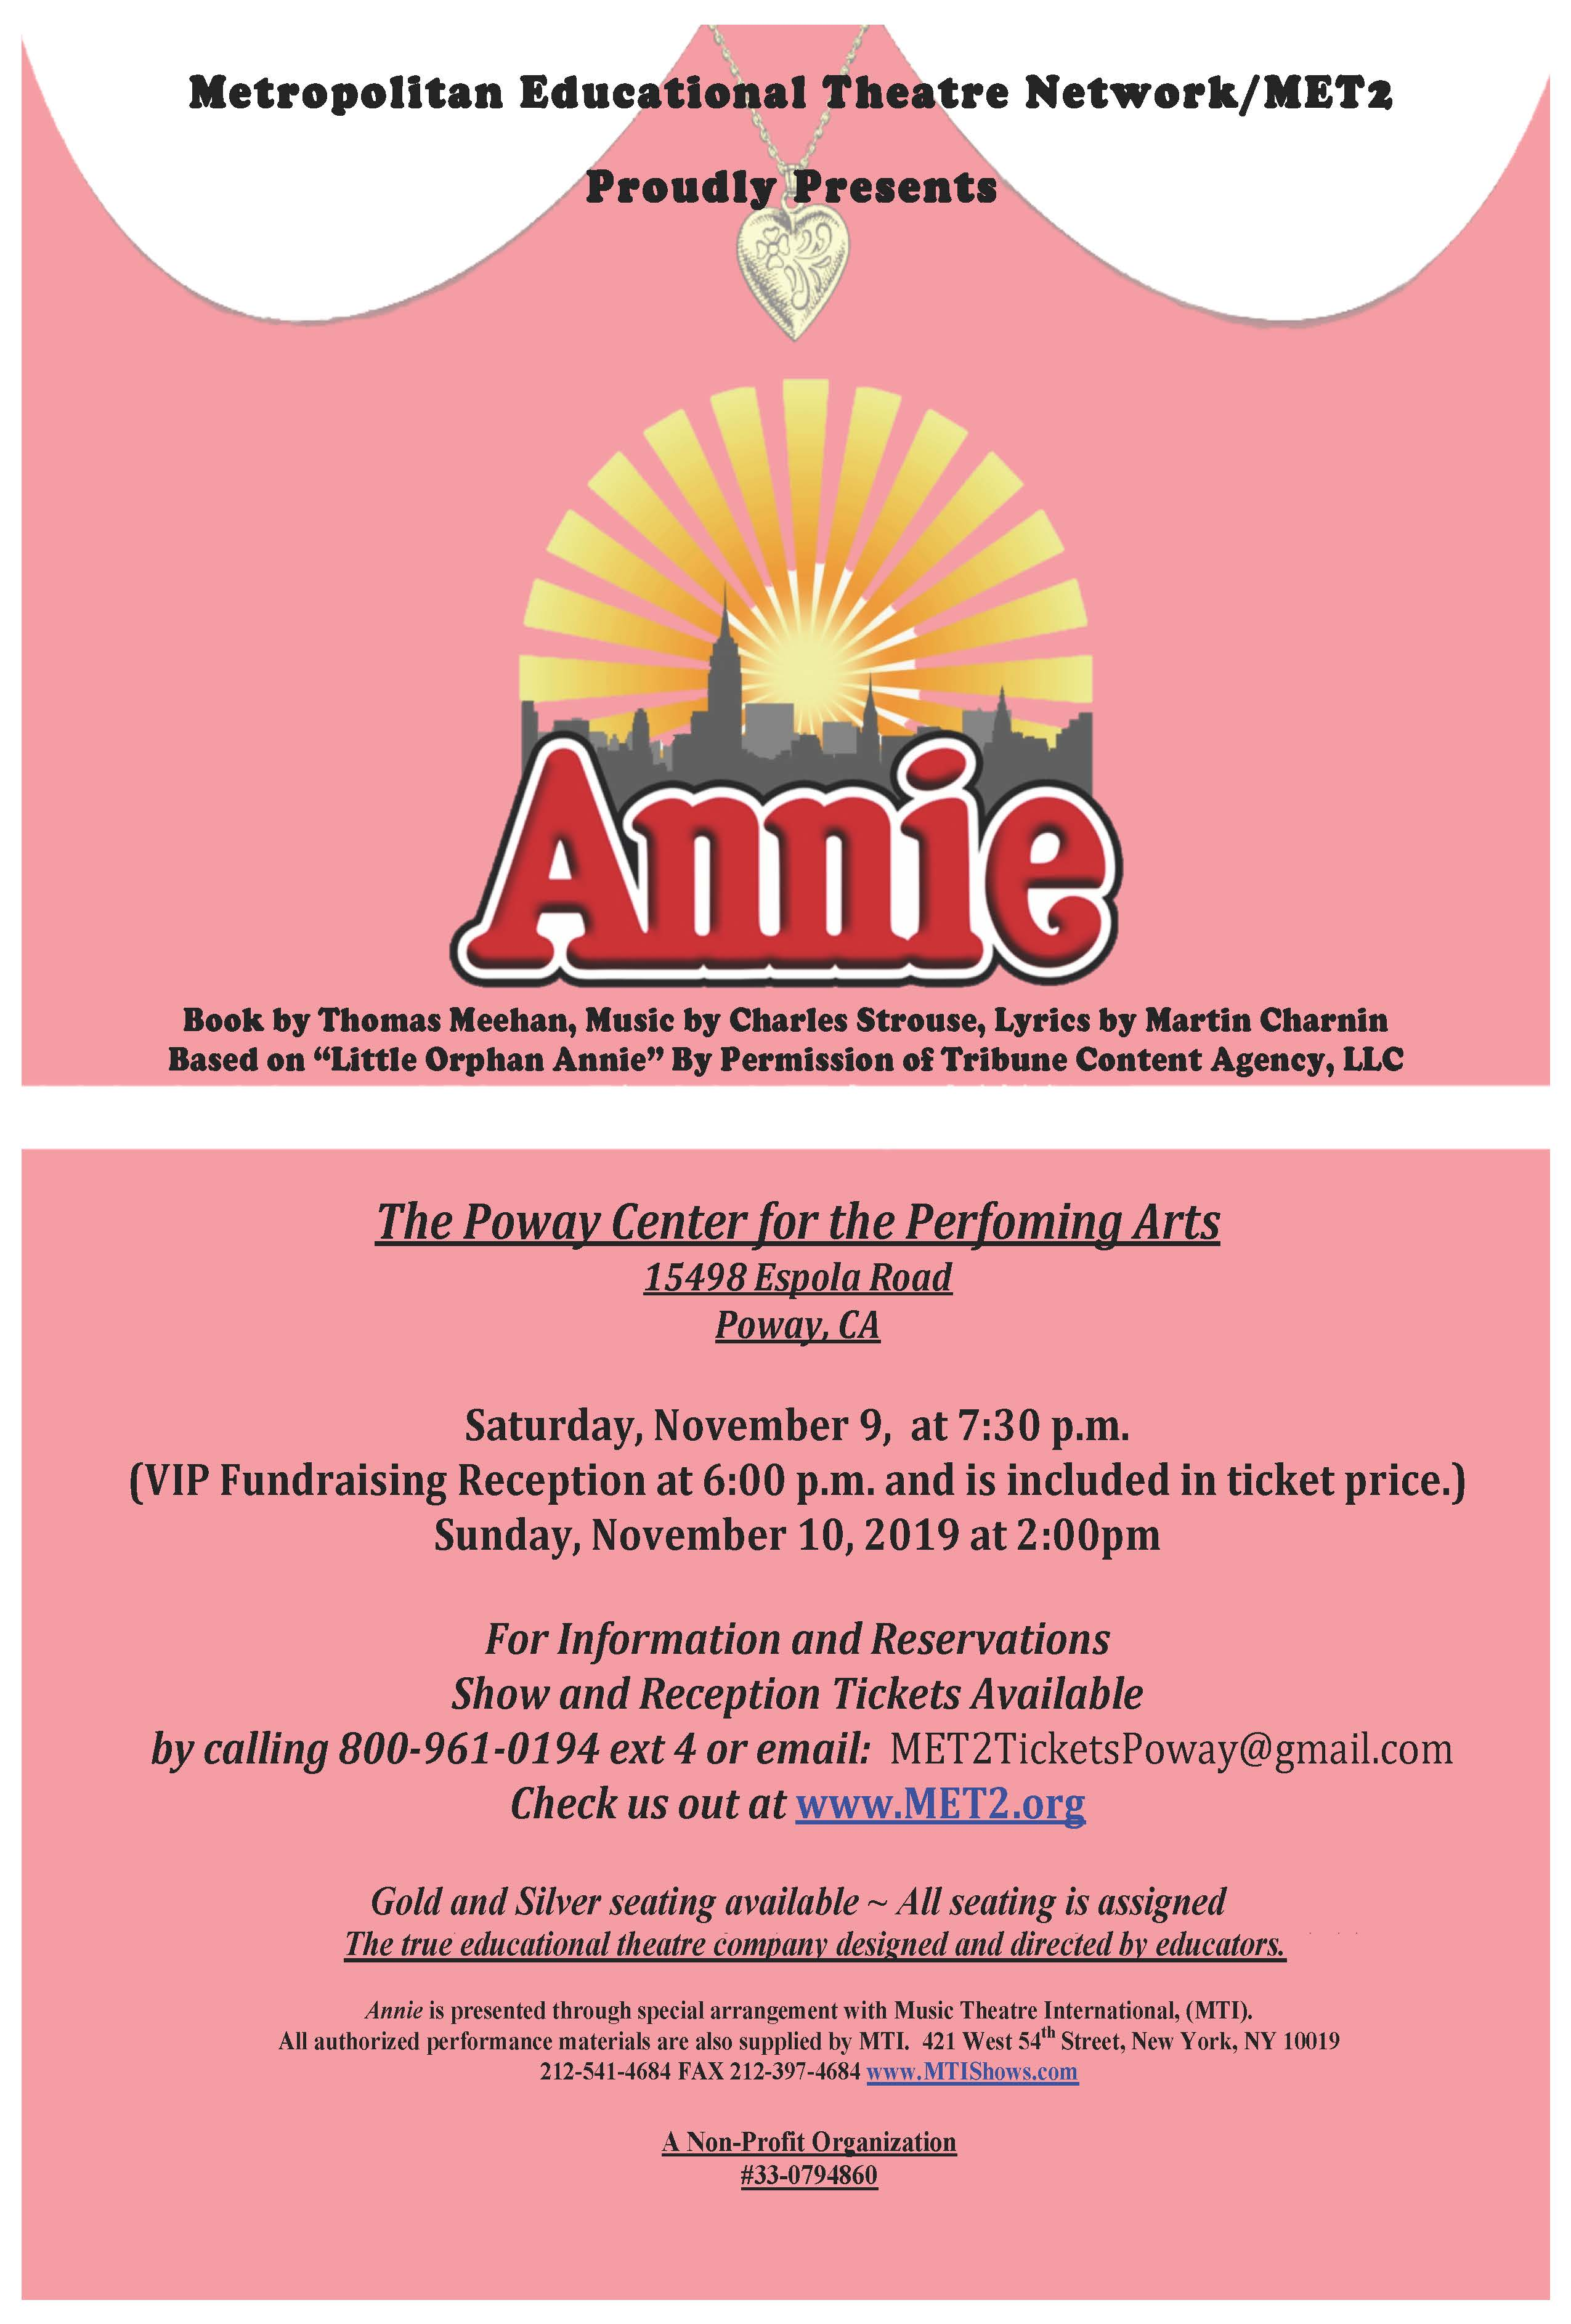 Annie Show Flyer Poway 2019